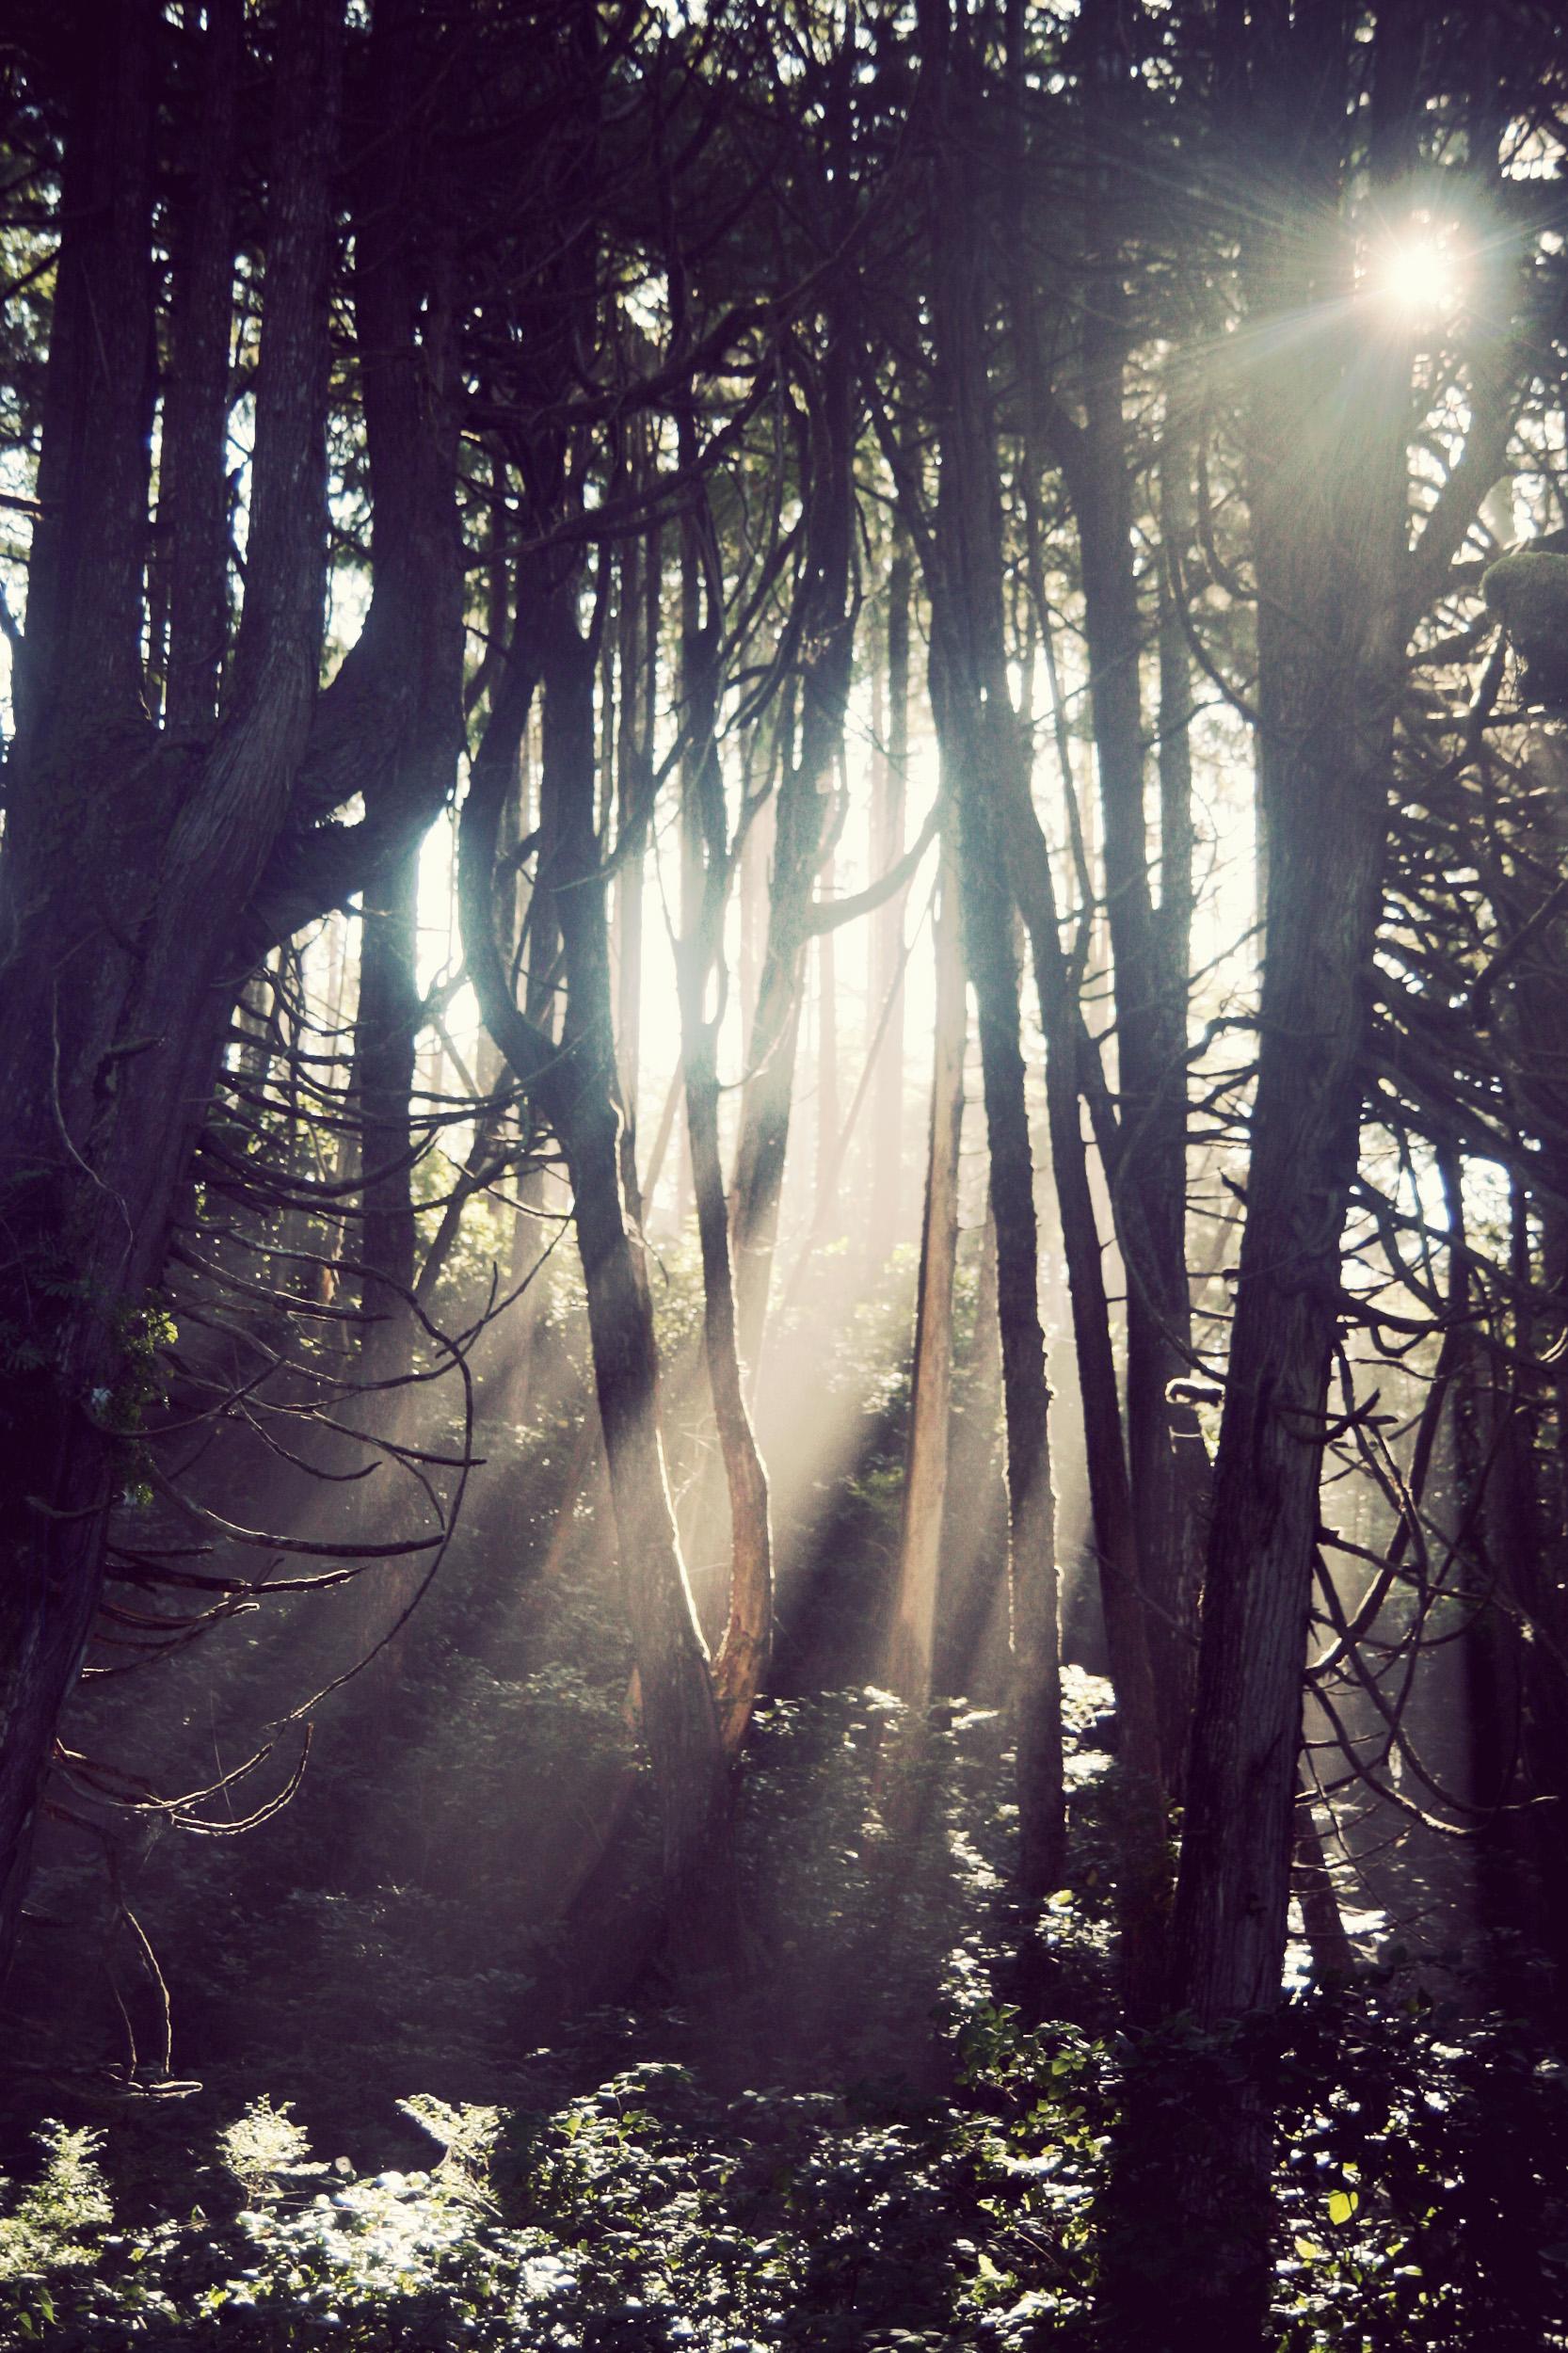 Wya-Point-Treelights_03.jpg